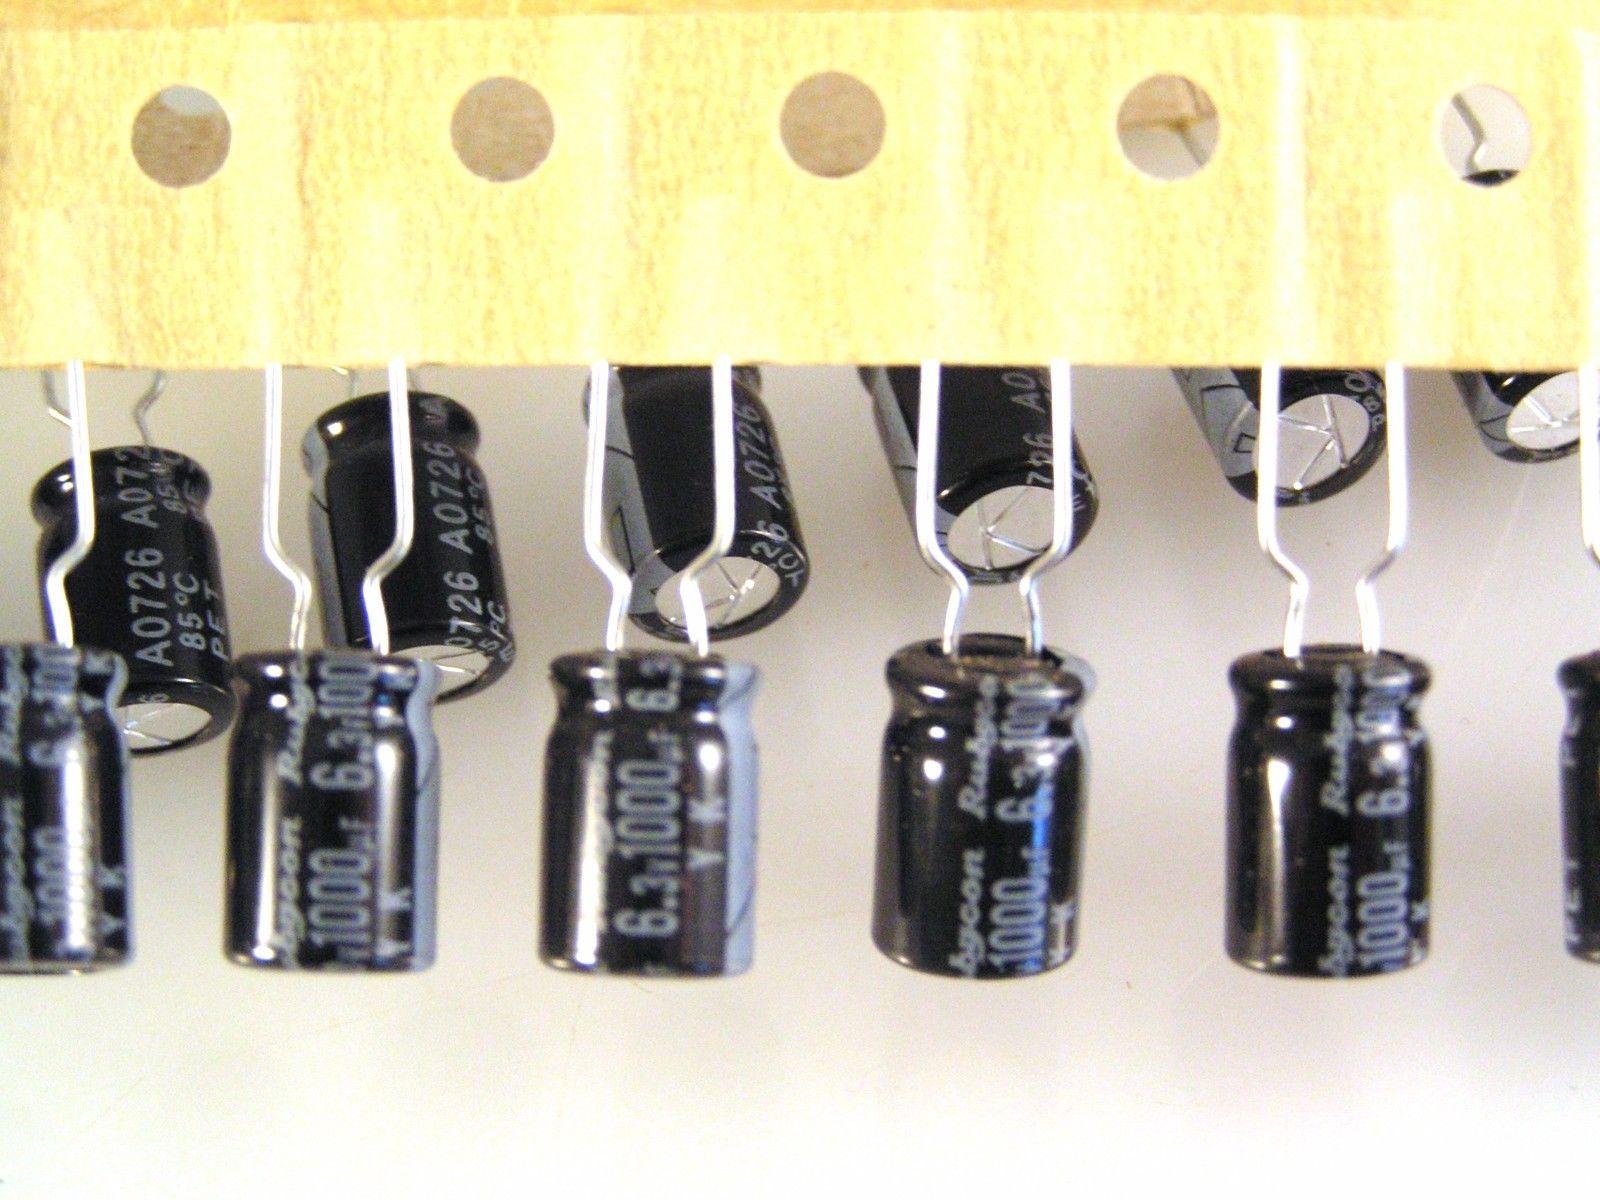 Rubycon YXF 10v 470uf Electrolytic Capacitor 105/'C ROHS 10 pcs OL0070